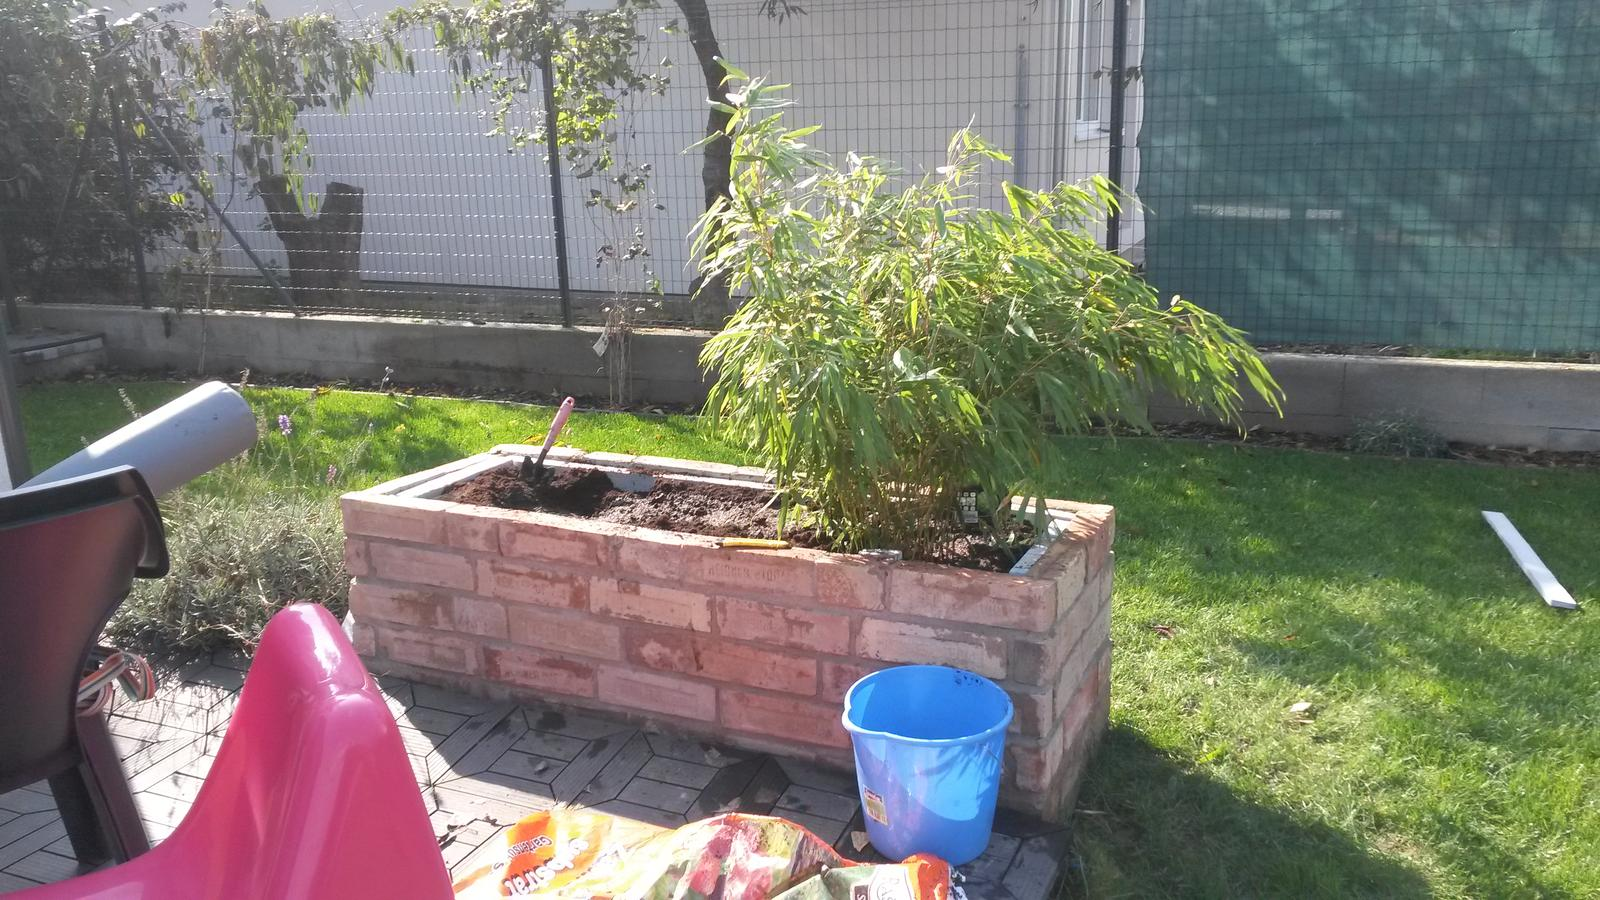 Záhradka - Bola som sikovna. Navlacila som 25 kusov 70 litrovych vriec zeminy do mojich 4 kvetinacov. Dalsi bambustek zasadeny.